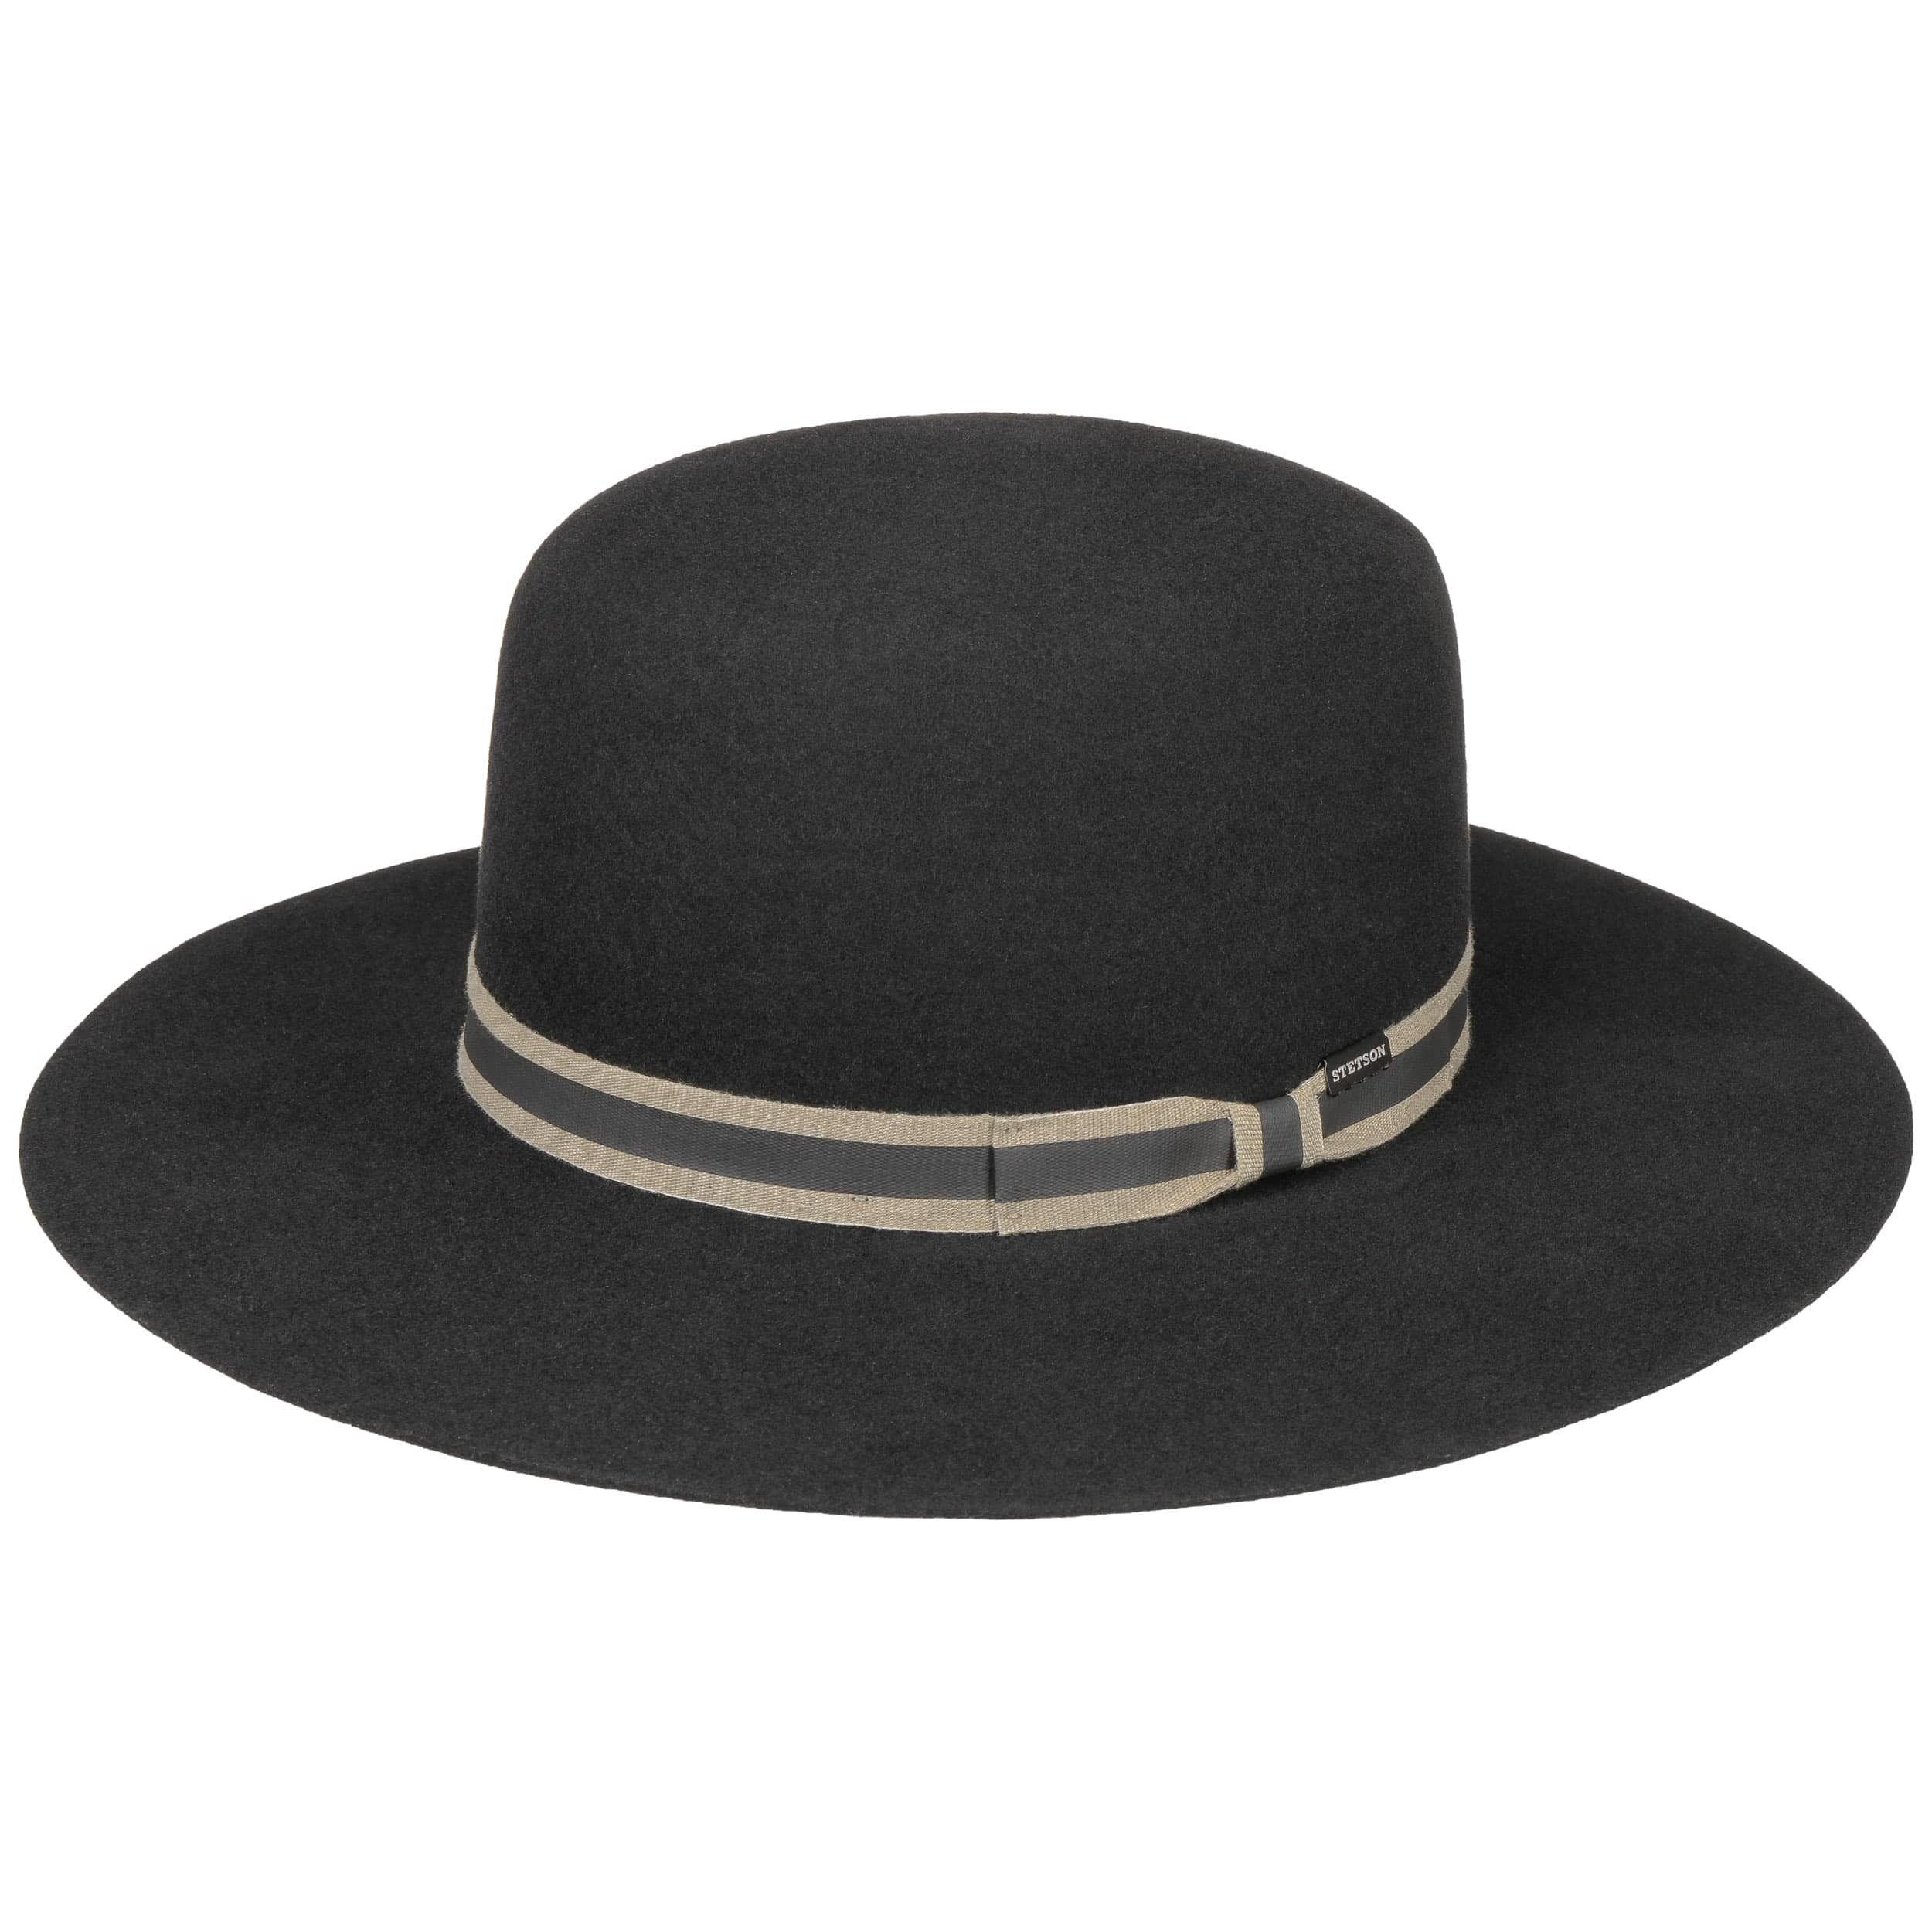 Amish Wool Felt Hat black